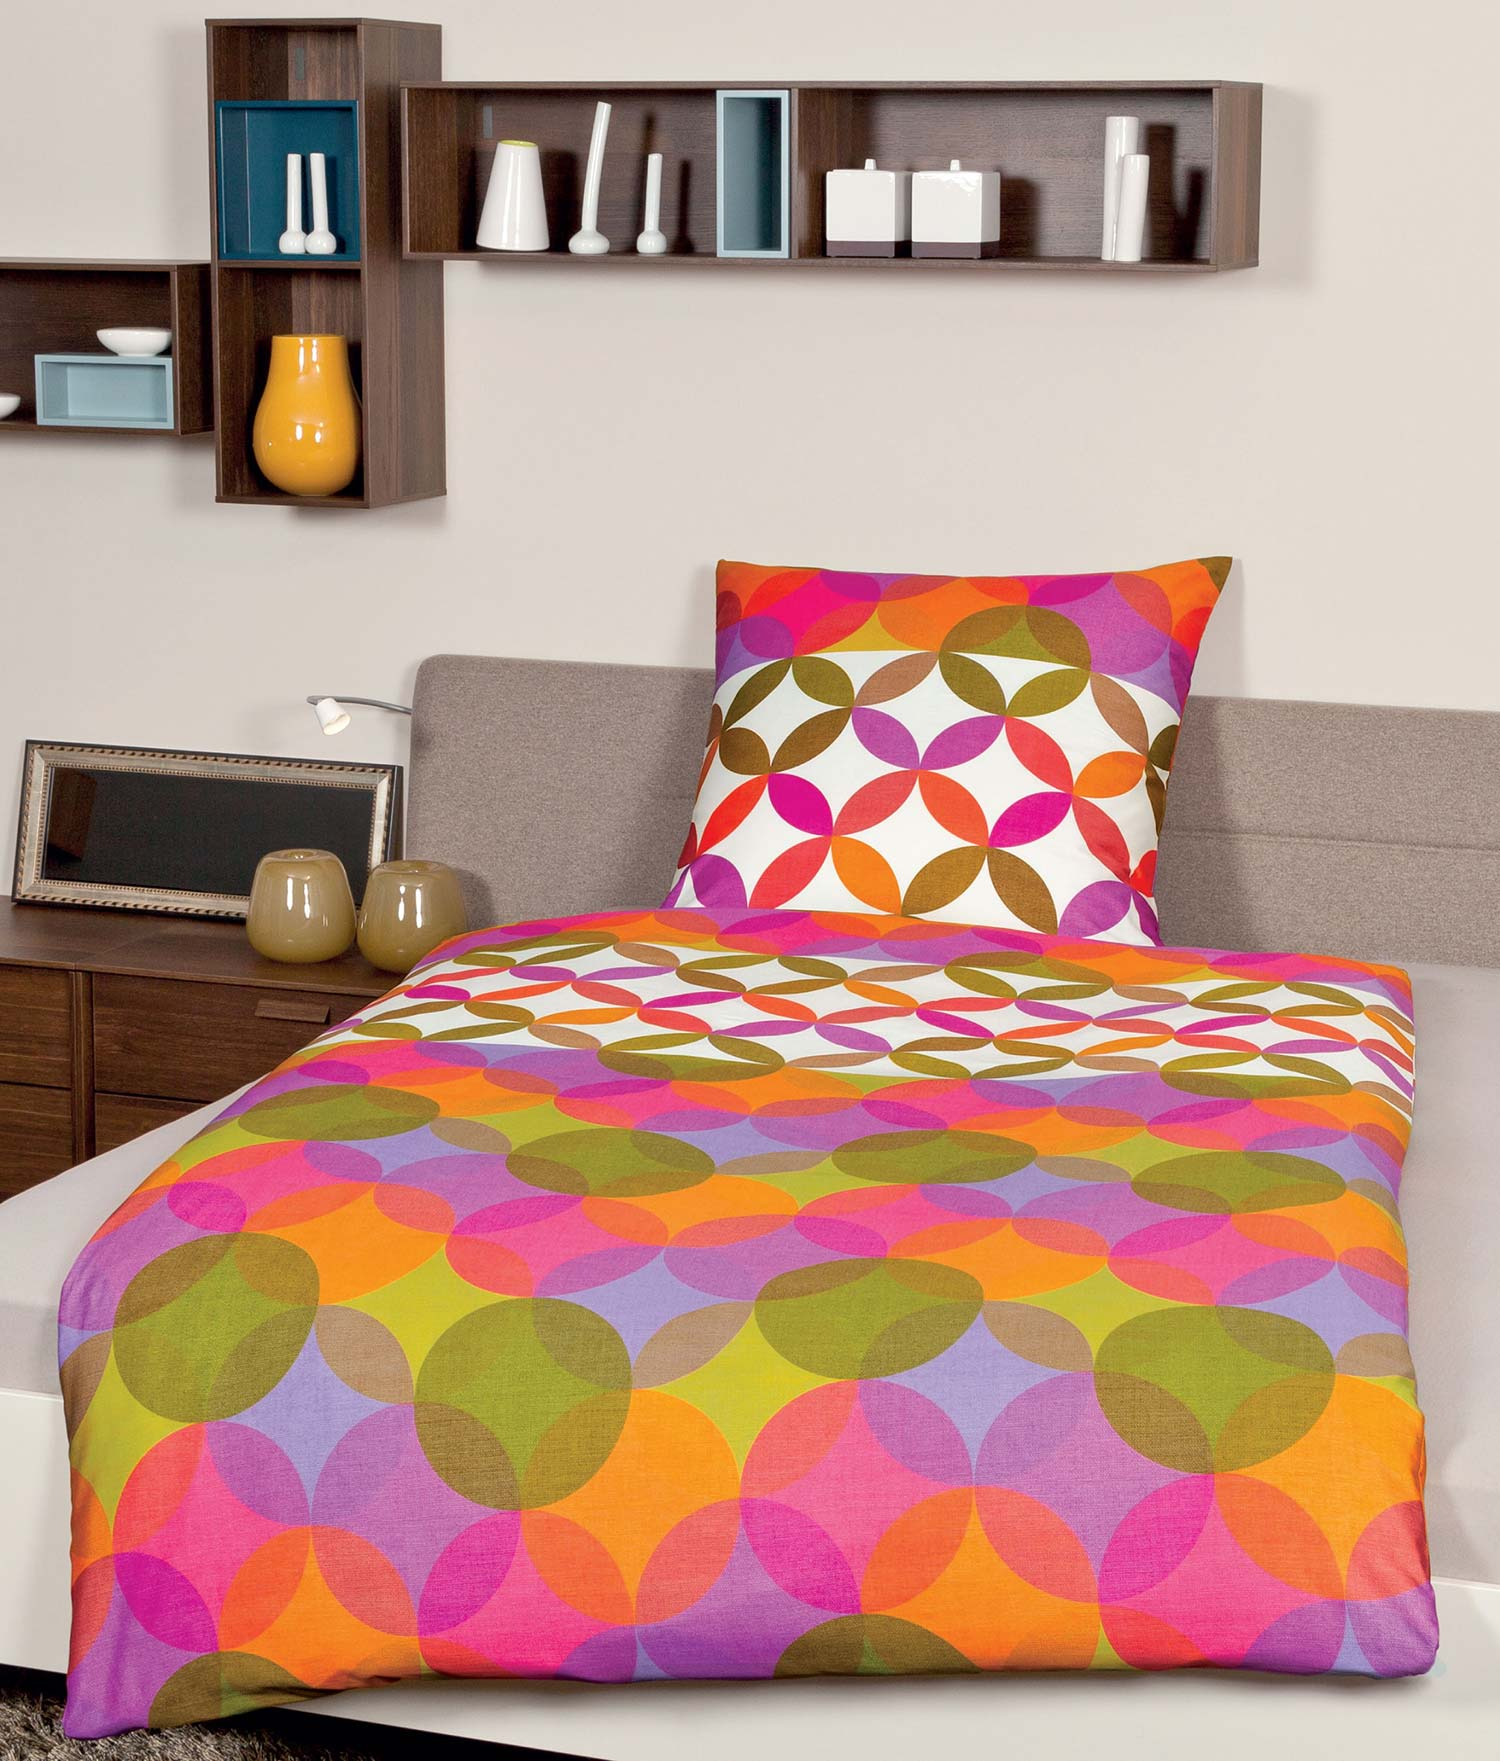 janine j d junge mako satin bettw sche garnitur blau gr n bunt kariert neu ebay. Black Bedroom Furniture Sets. Home Design Ideas